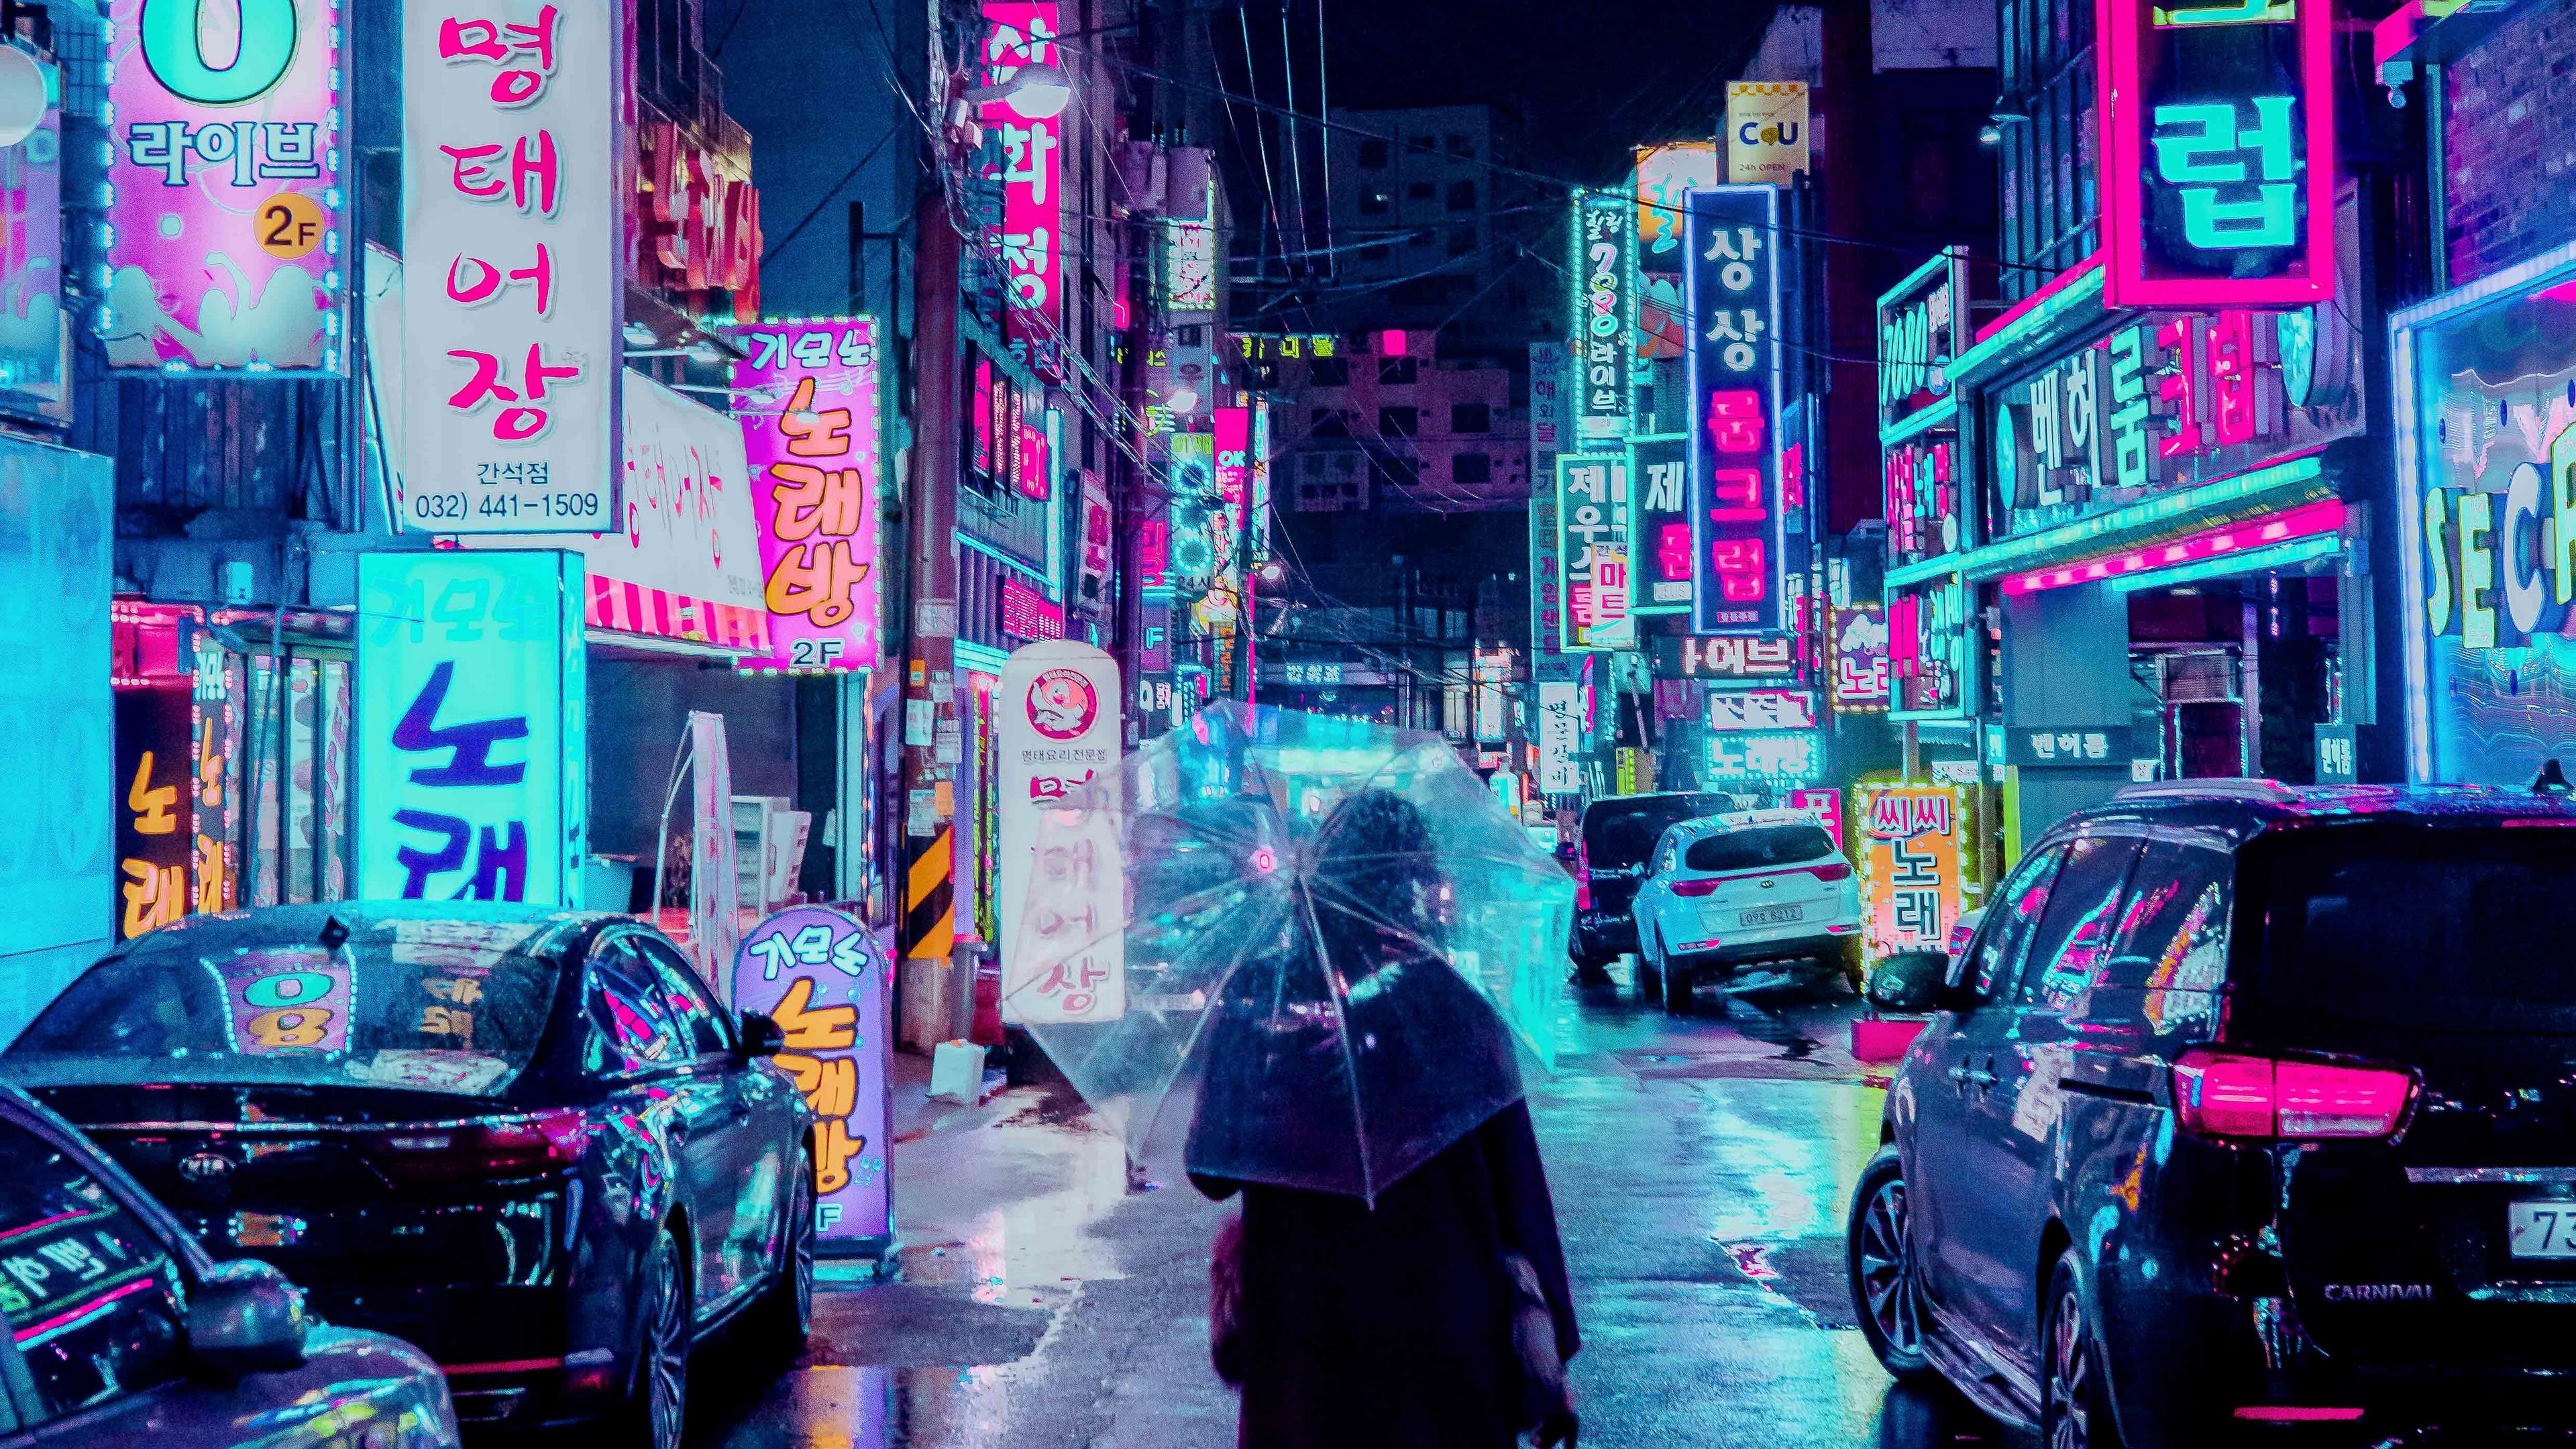 night city street umbrella man signboards lighting neon 4k 1538068839 - night city, street, umbrella, man, signboards, lighting, neon 4k - Umbrella, Street, night city